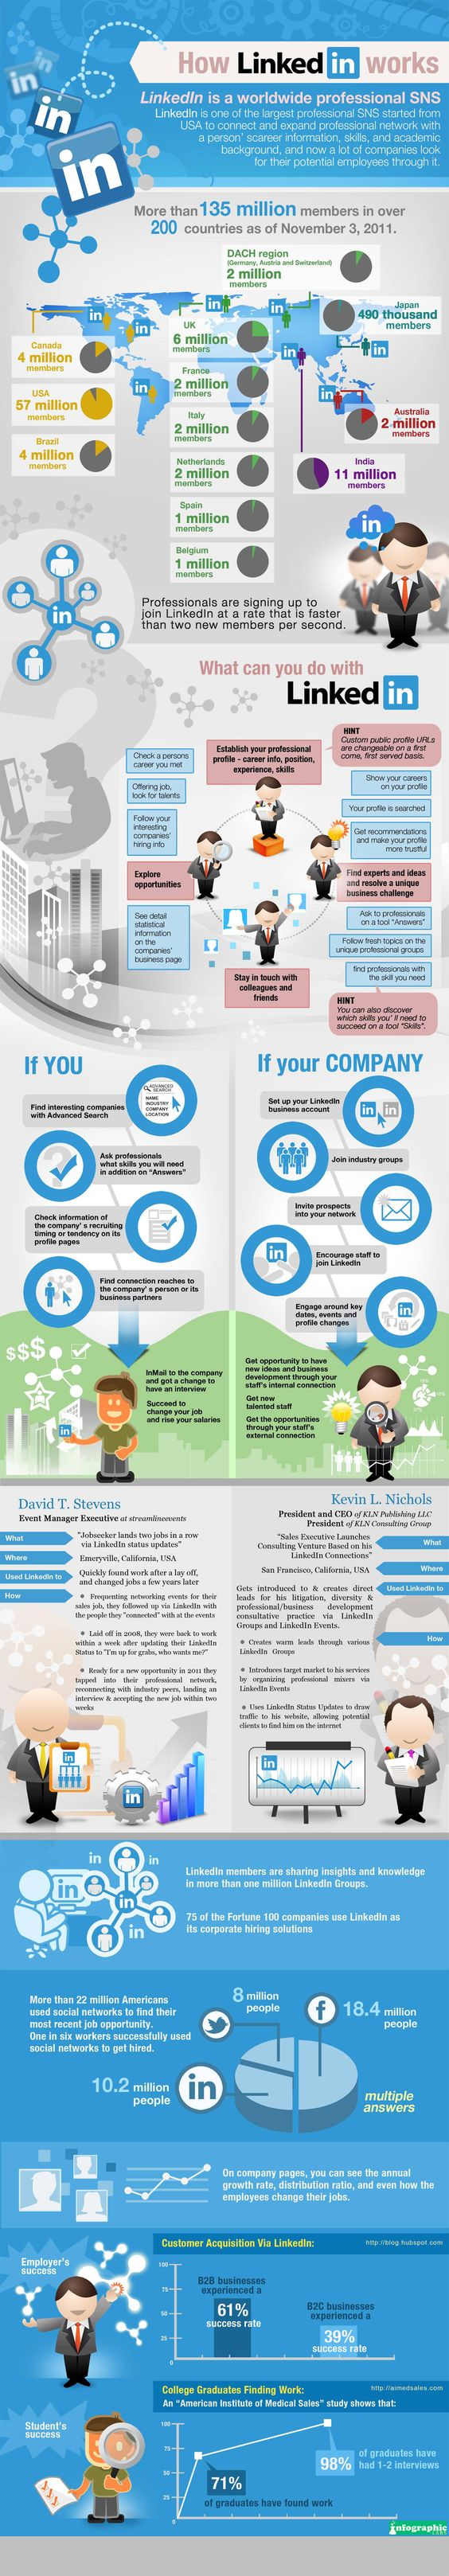 Como trabaja LinkedIn – #infografia #infographic